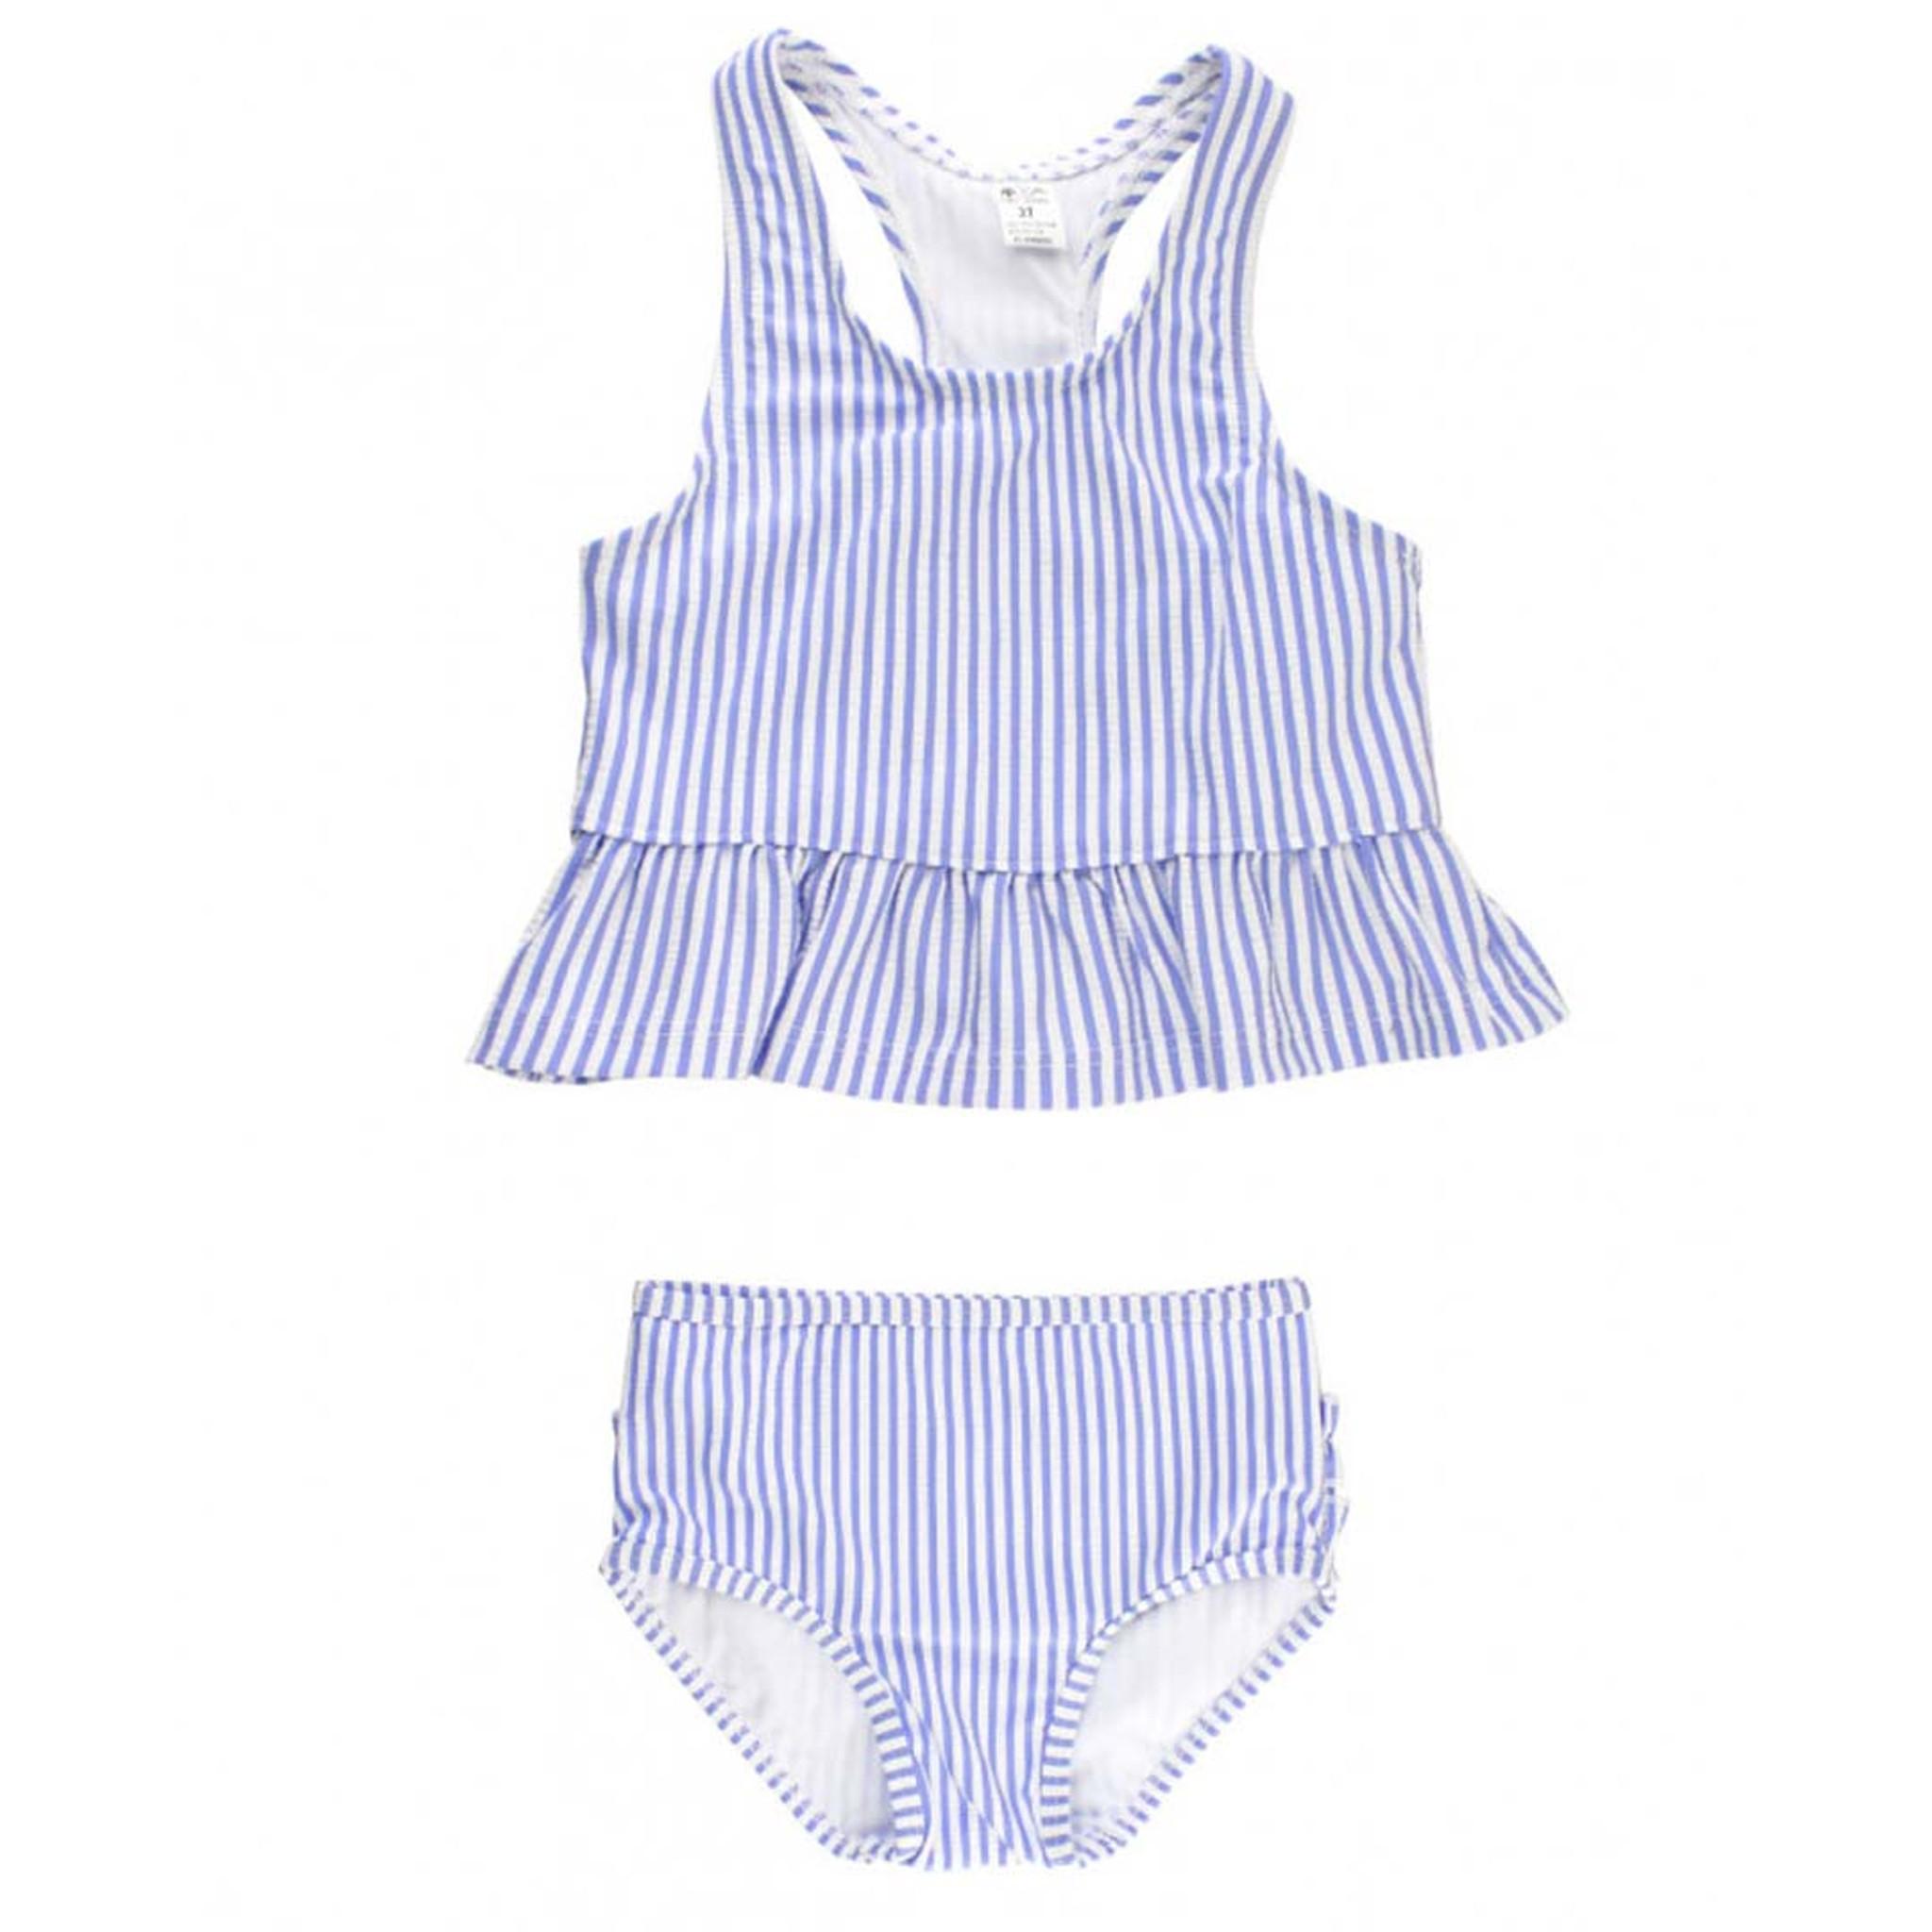 Toddlers  Periwinkle Blue Seersucker Tankini Set - TYLER S 7da8e4fc75a2